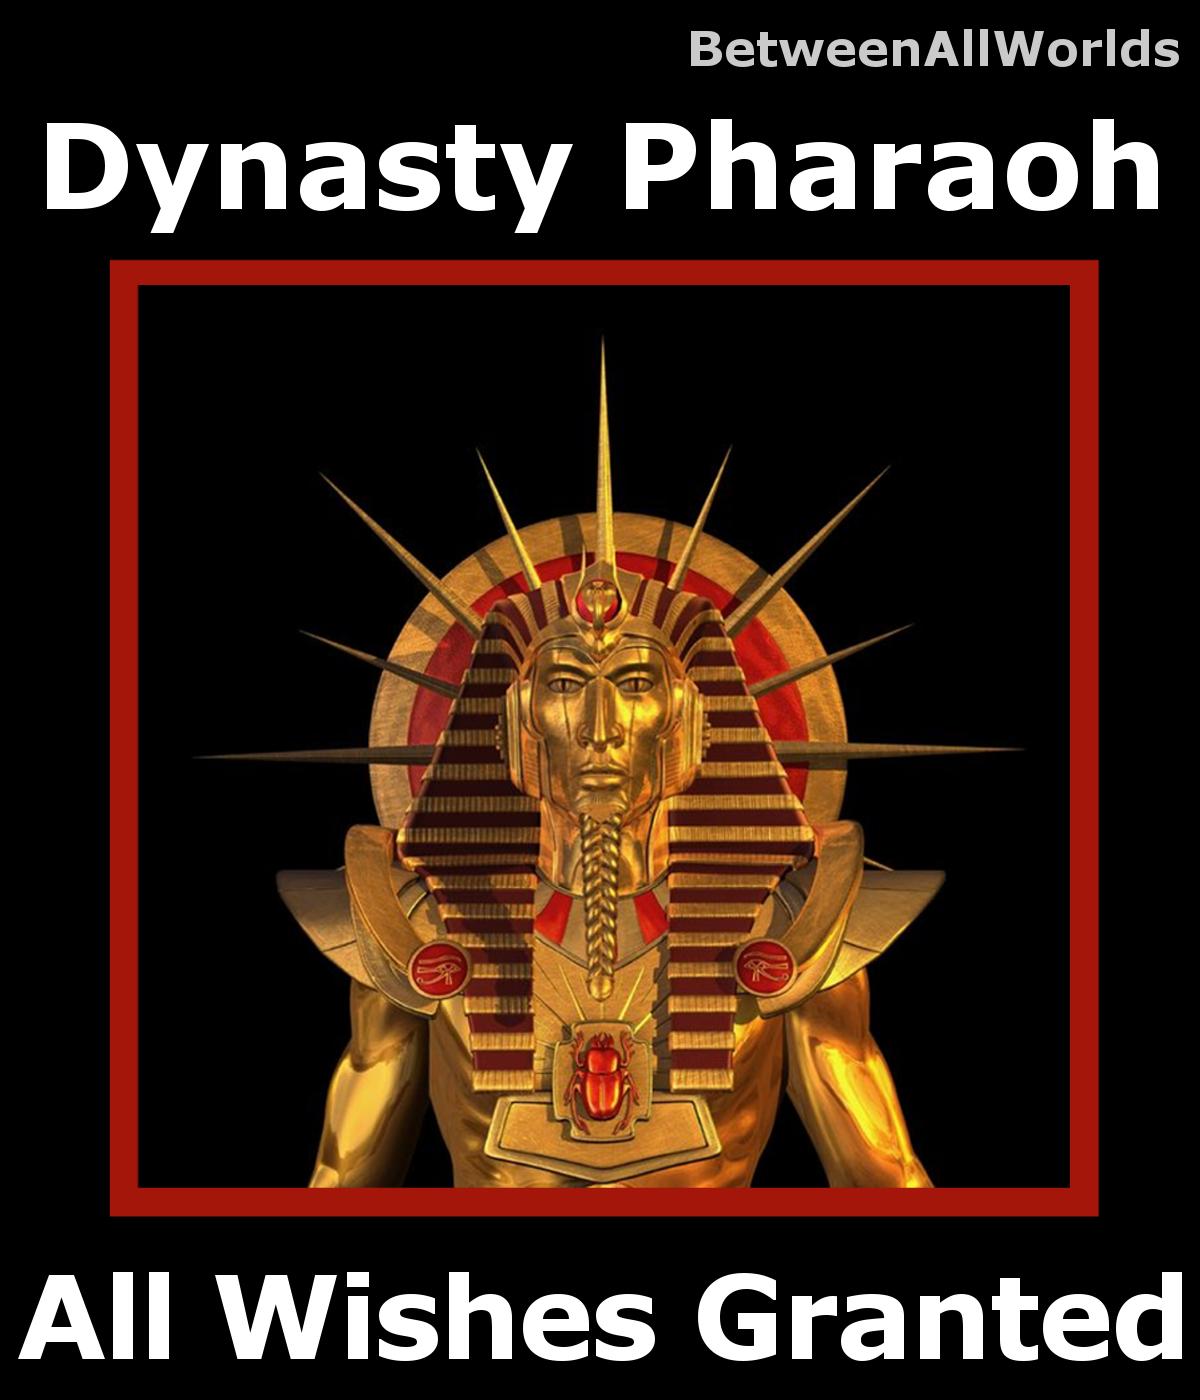 spr Dynasty Pharaoh Djinn All Wishes Granted + BetweenAllWorlds Wealth Spell - $155.36